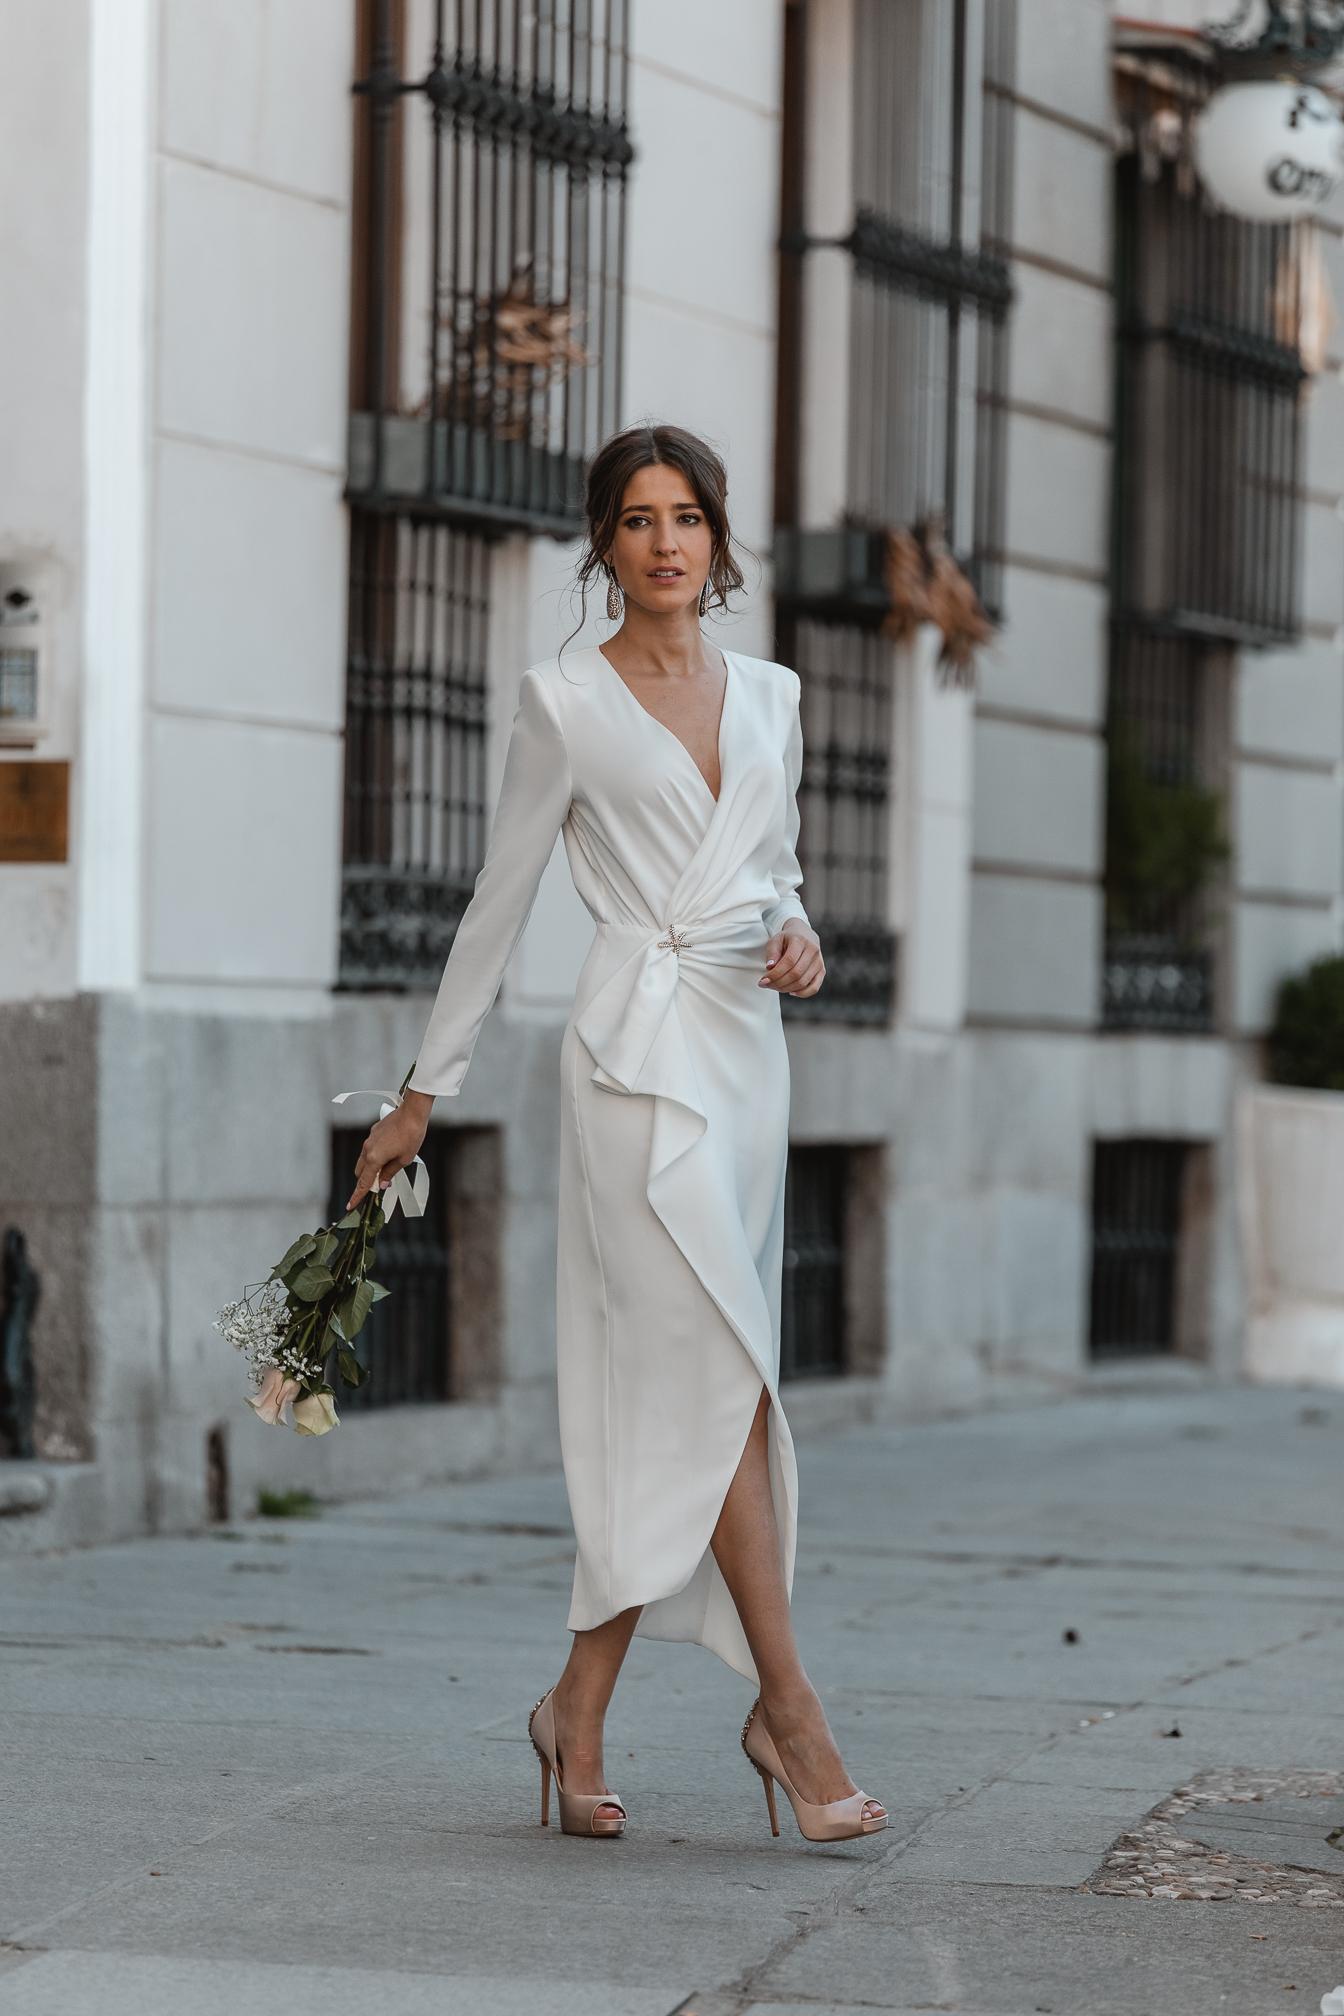 vestido blanco novia civil lowcost